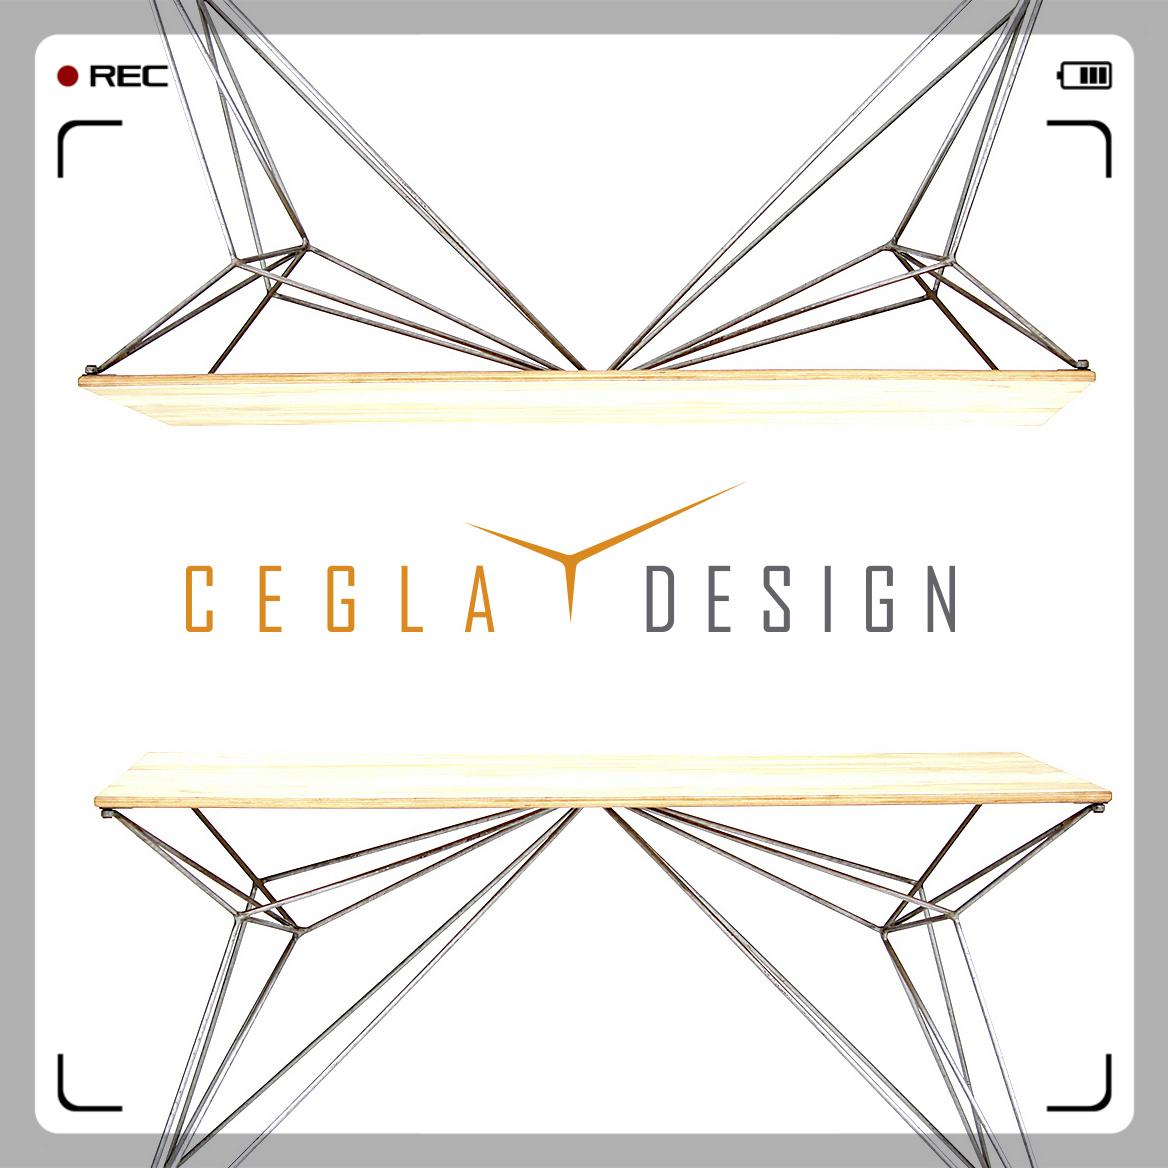 Logo design for Yurii Cegla